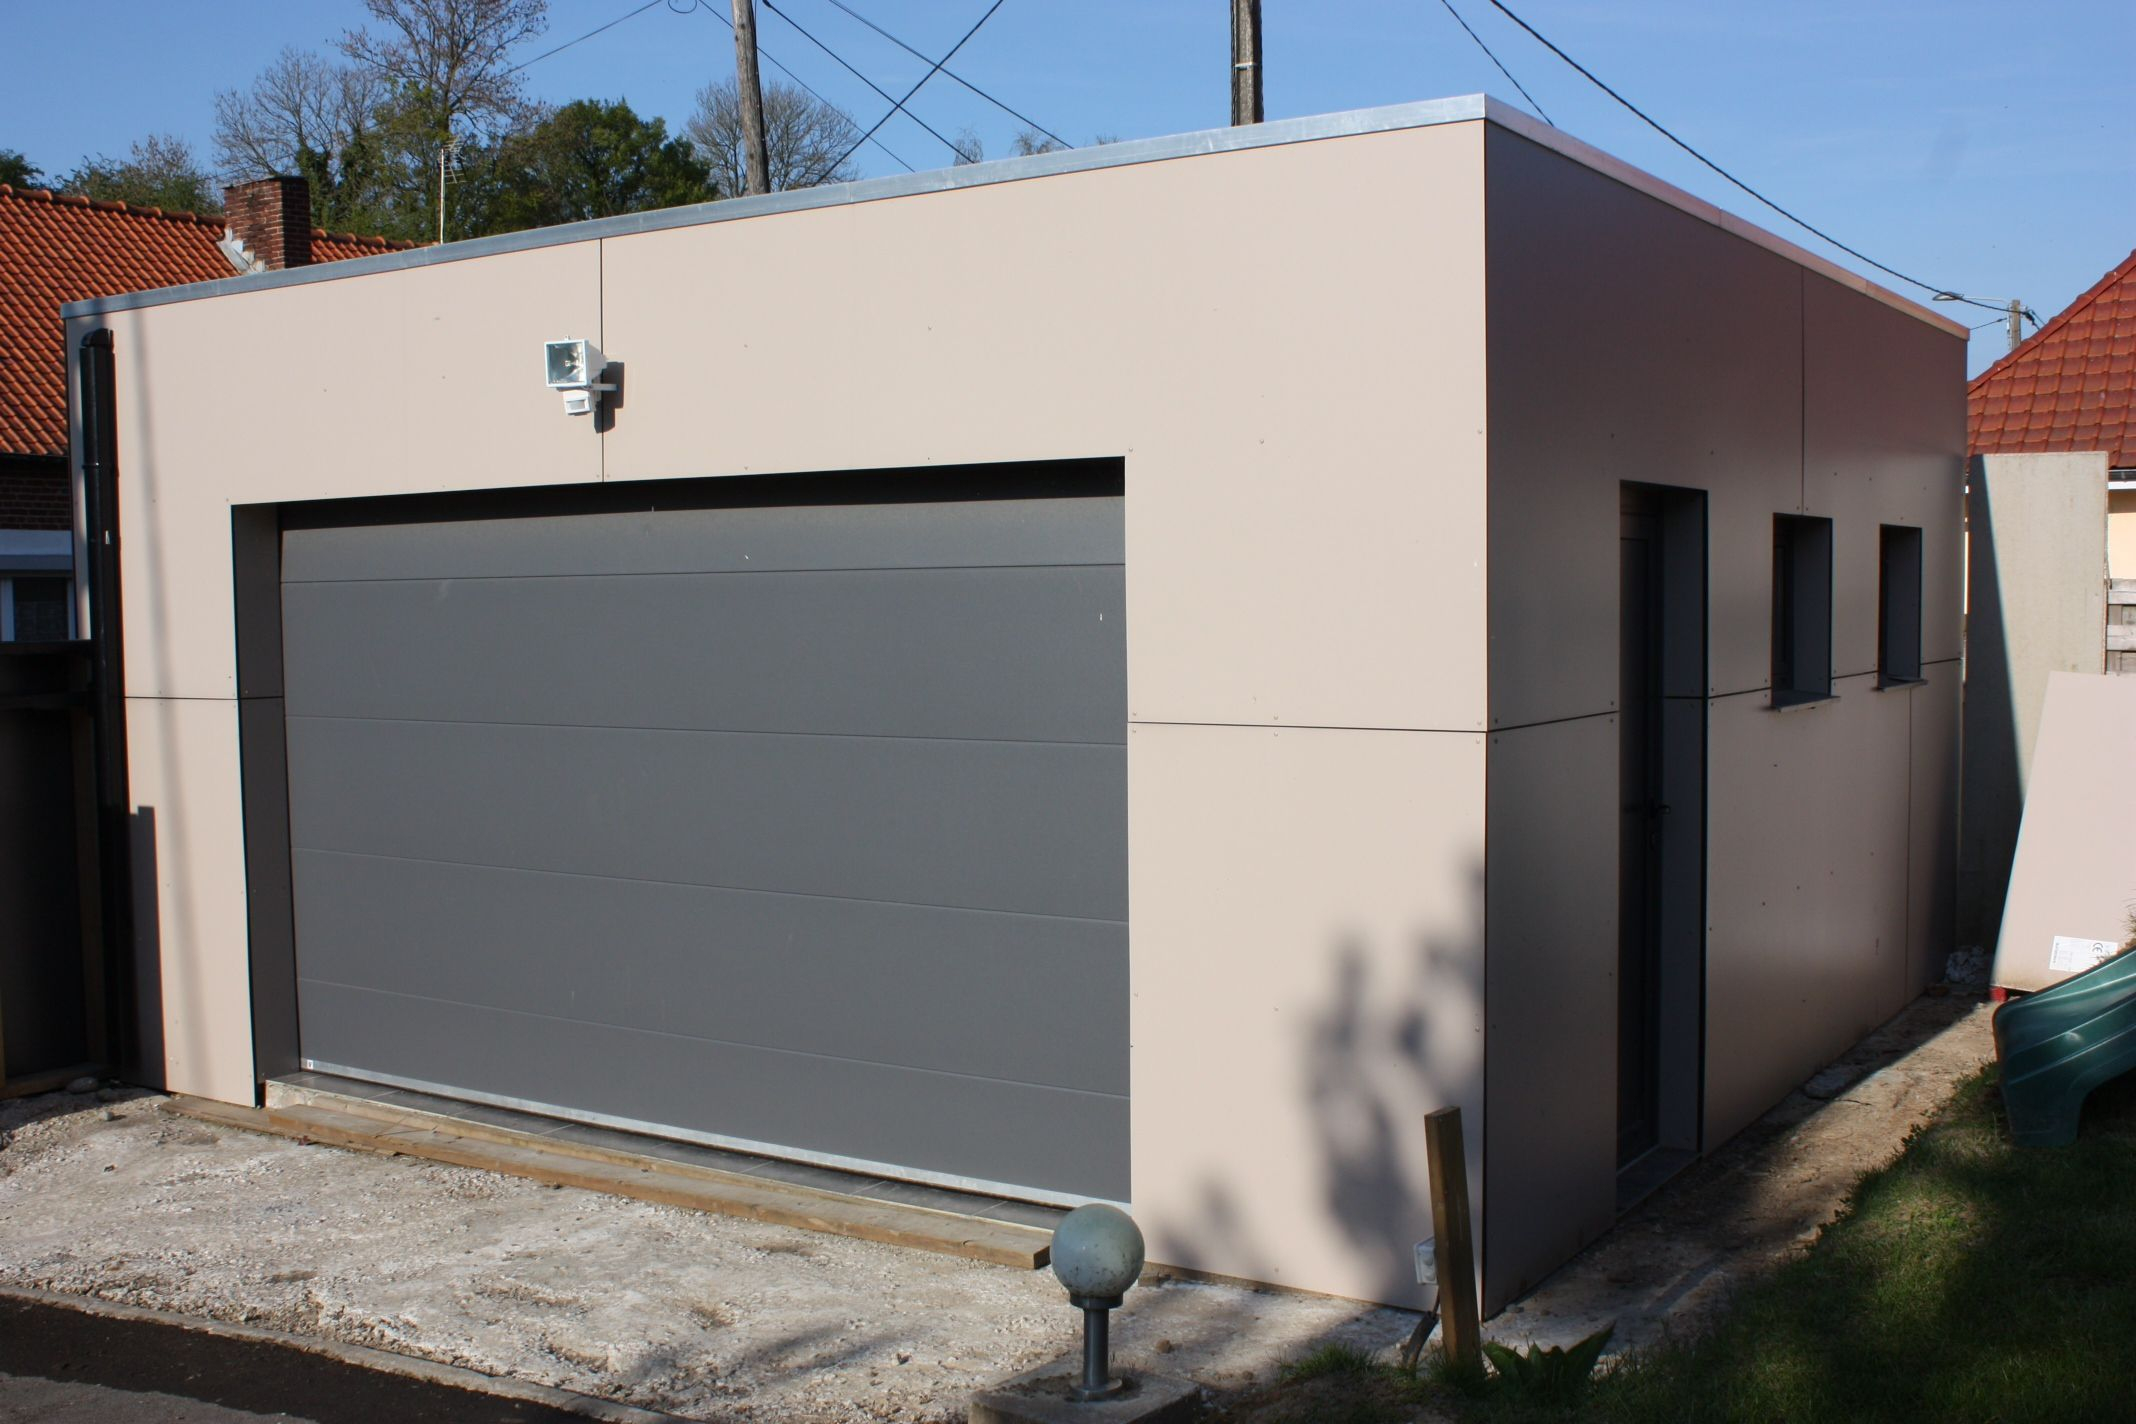 Garage Trespa | Large Pergola | Garage Pergola, Garage ... à Acrotere Toit Plat